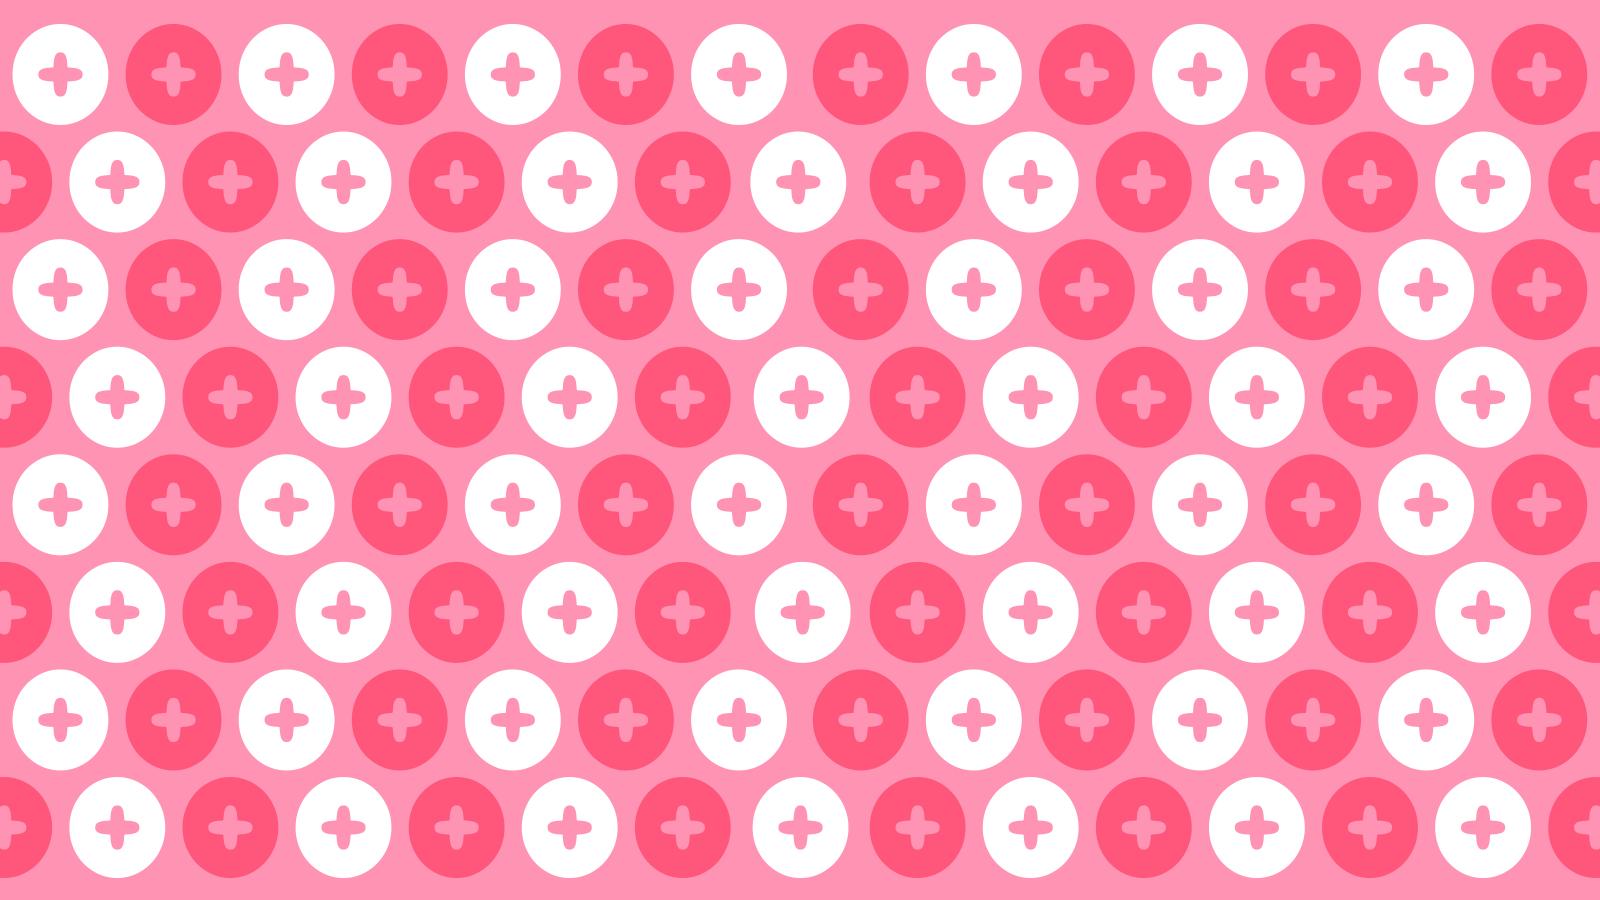 LENGUAJE-POSITIVO_lamadredelosbeatles_pattern